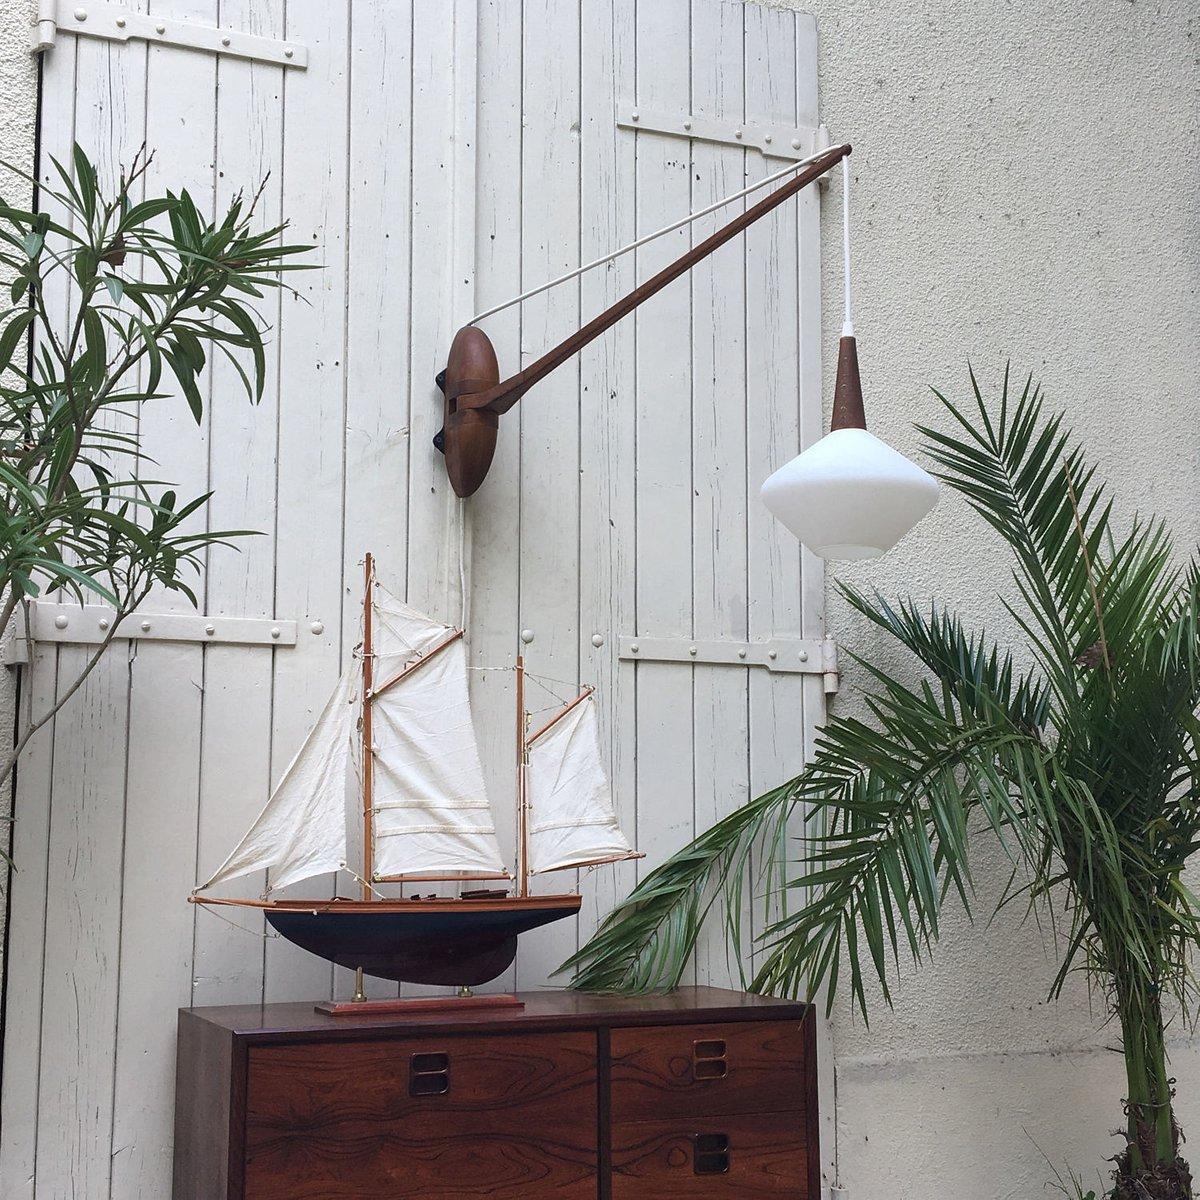 skandinavische lampe aus holz opalglas 1960er bei pamono kaufen. Black Bedroom Furniture Sets. Home Design Ideas